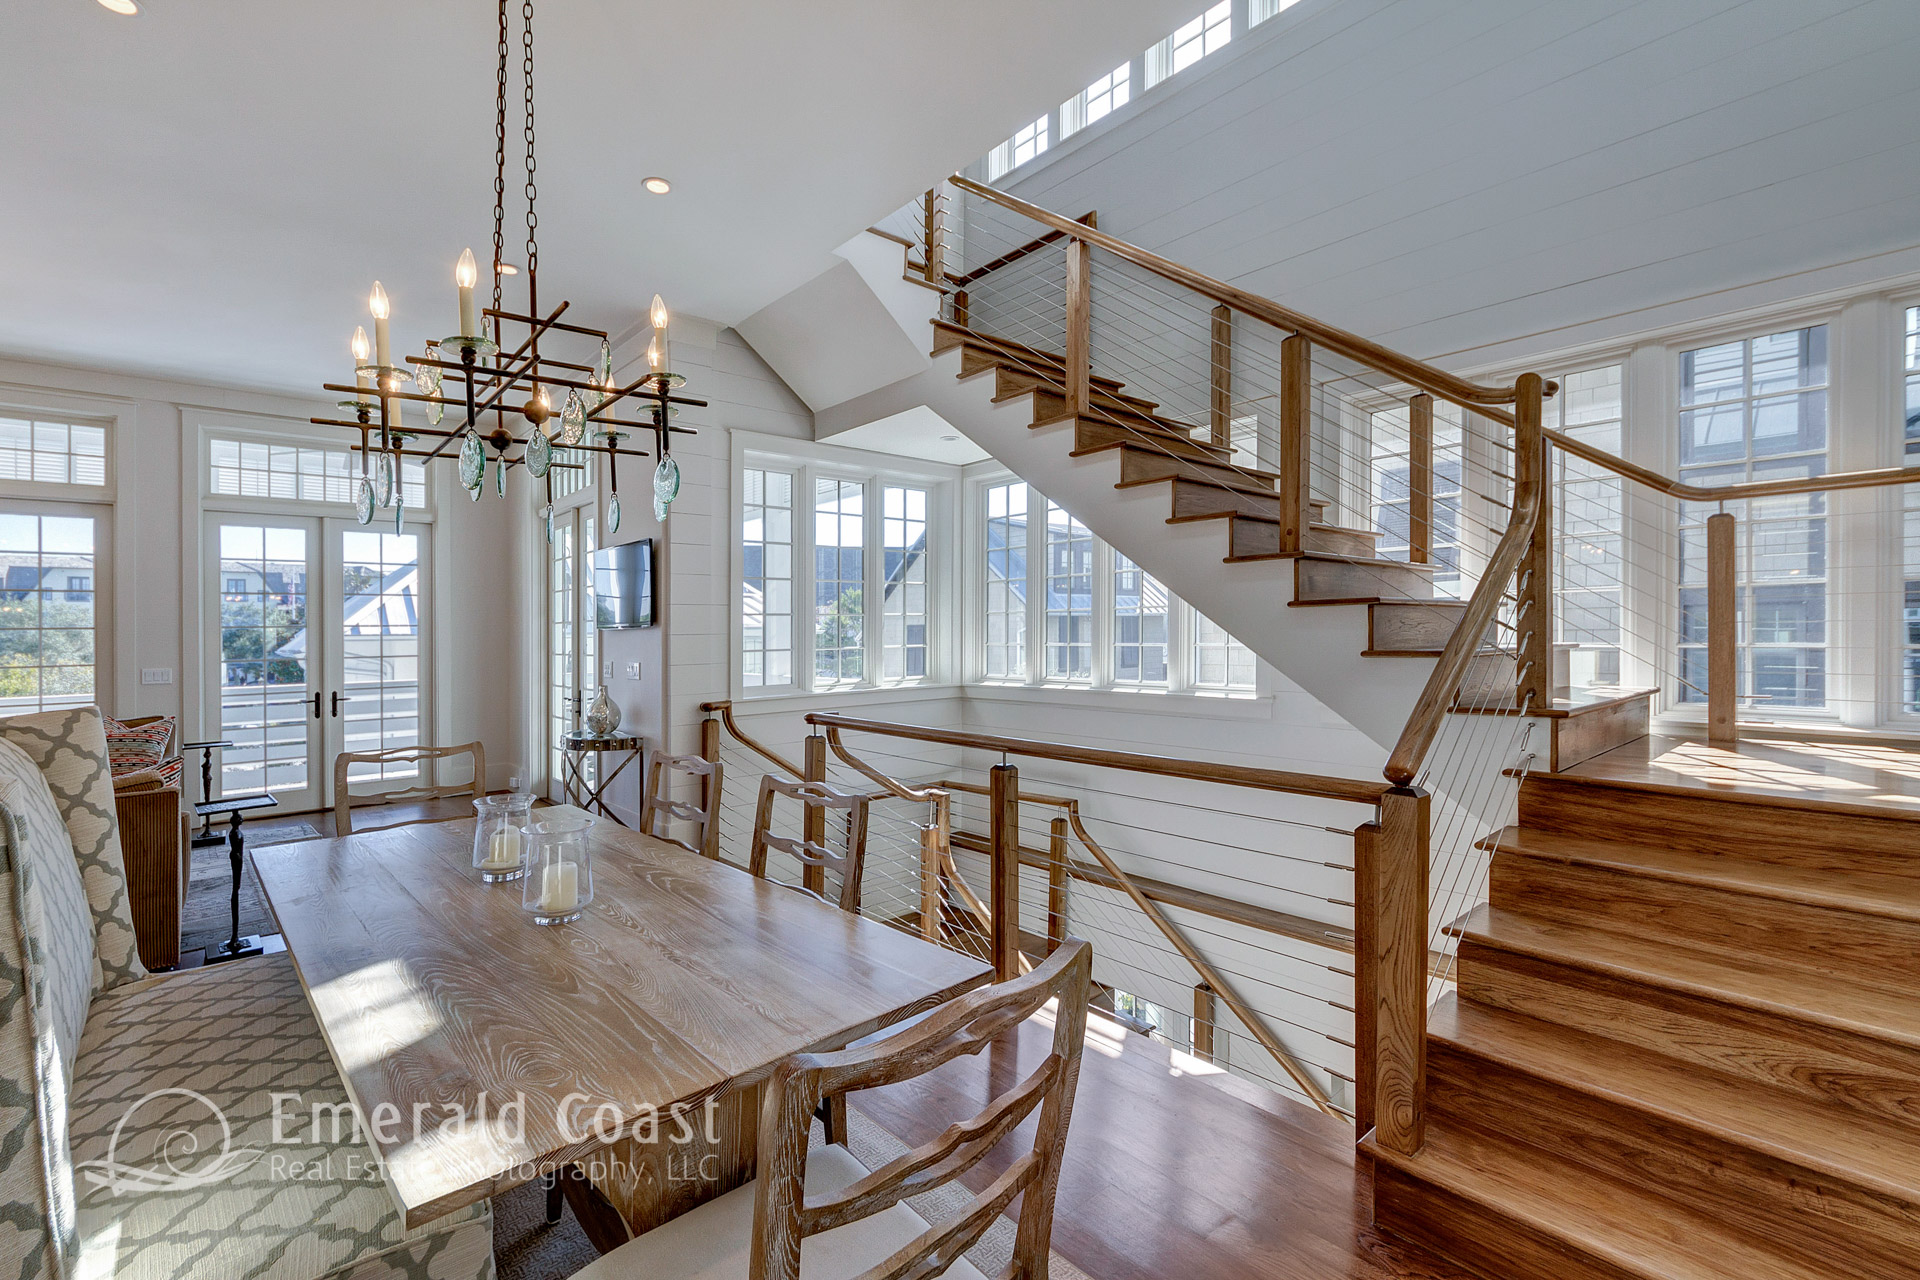 Craigslist Fort Walton Beach >> Emerald Coast Real Estate Photography » 30A Real Estate ...